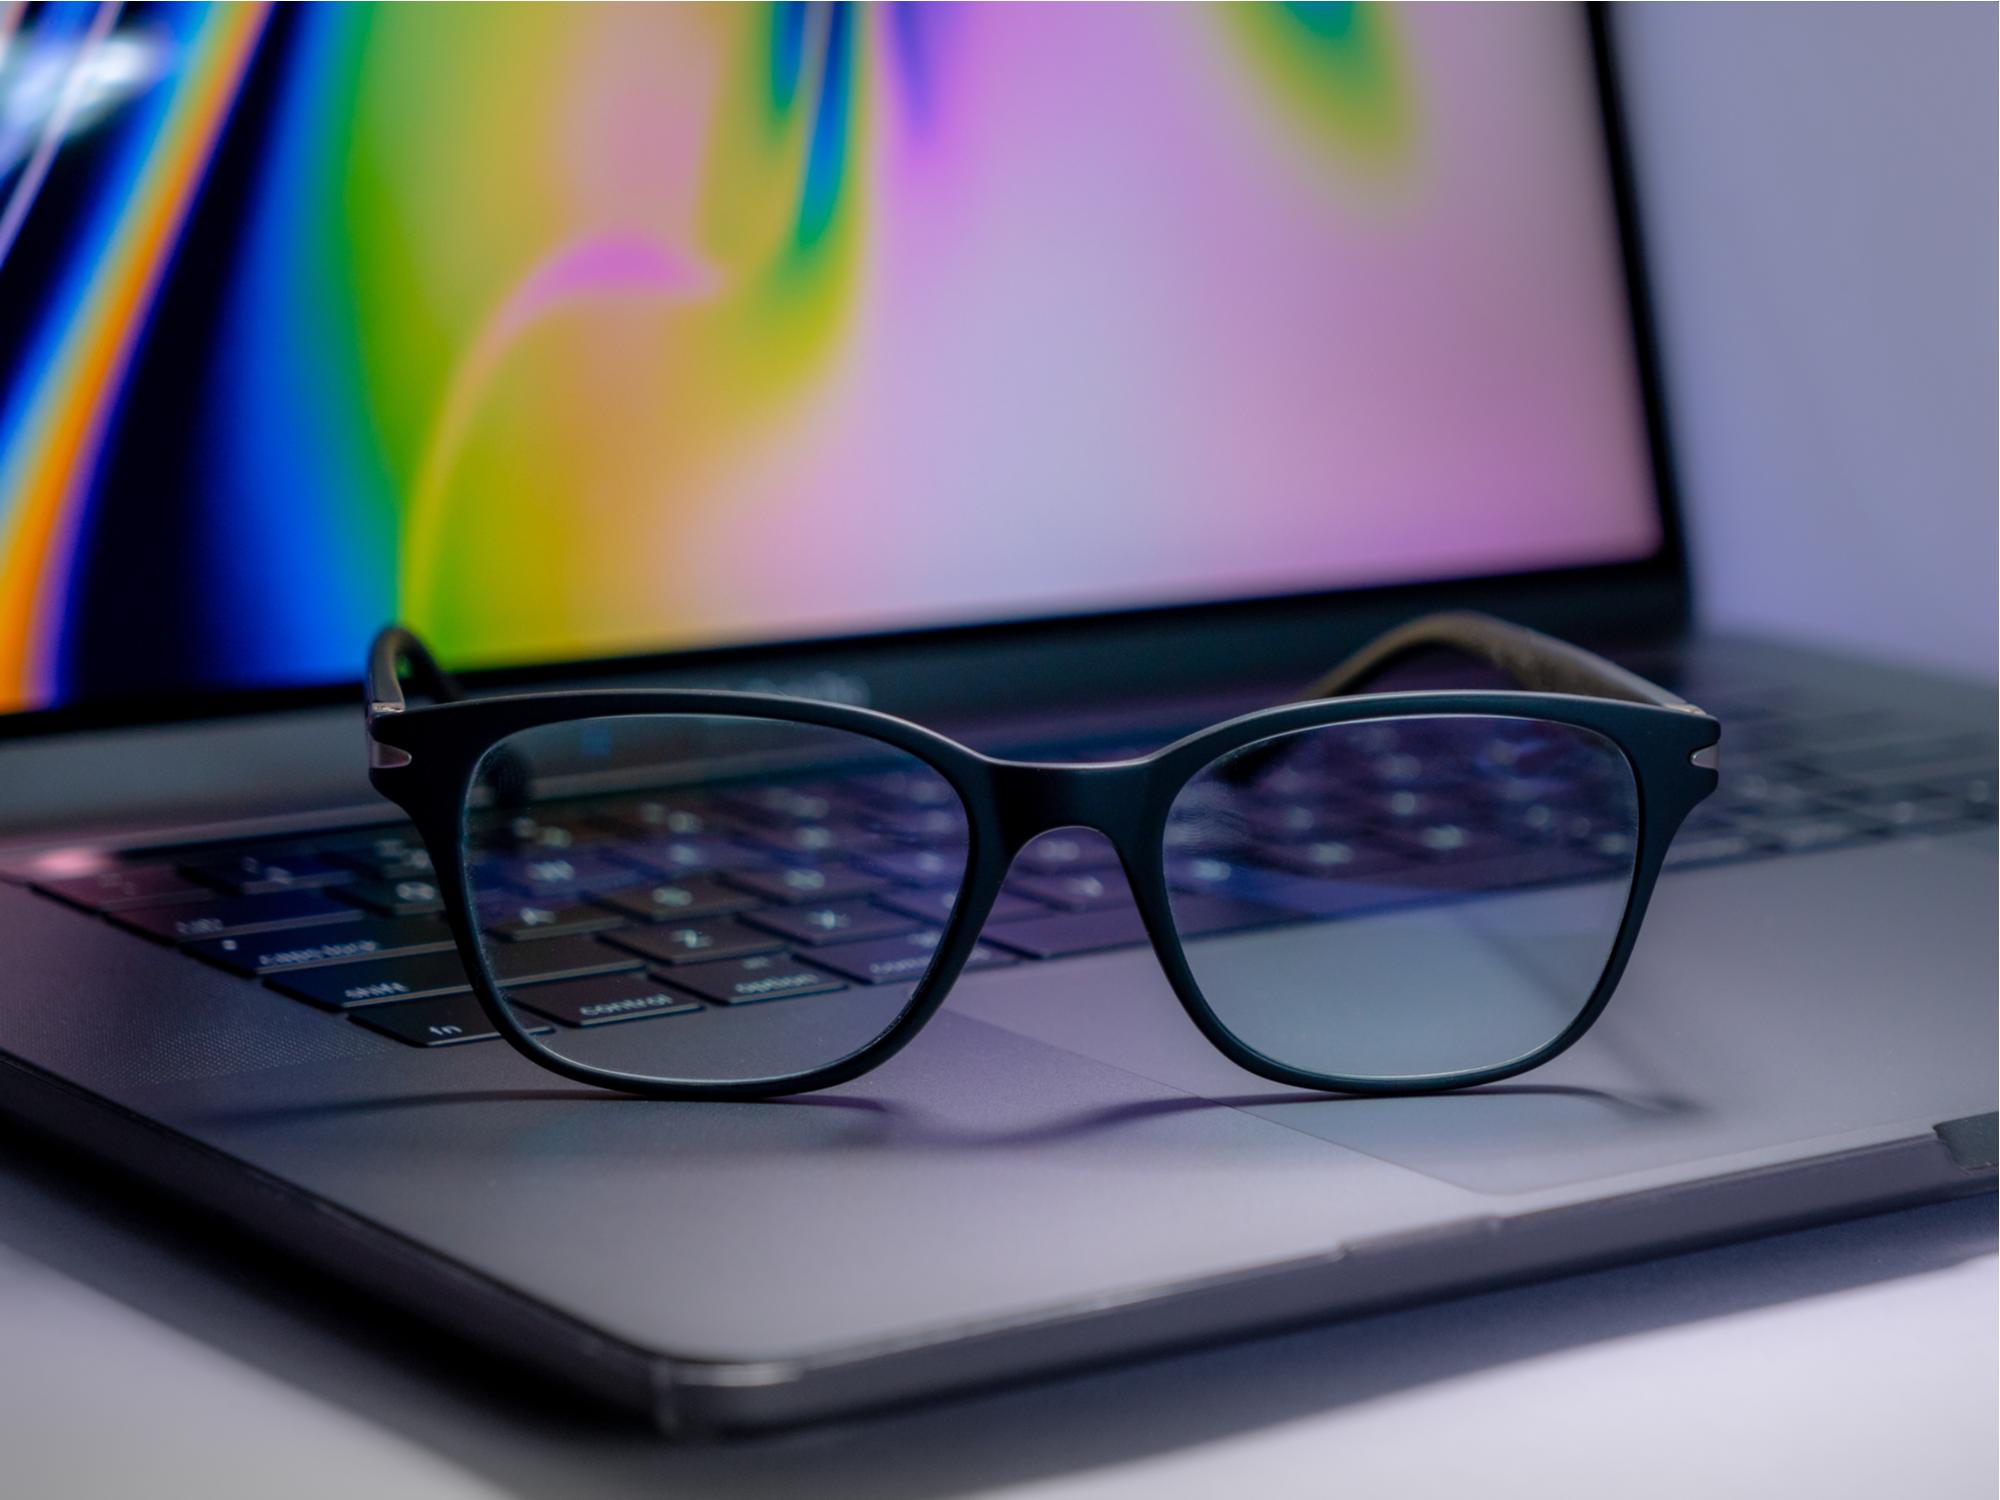 Importance of Blue Light Lenses for Digital Screen Protection